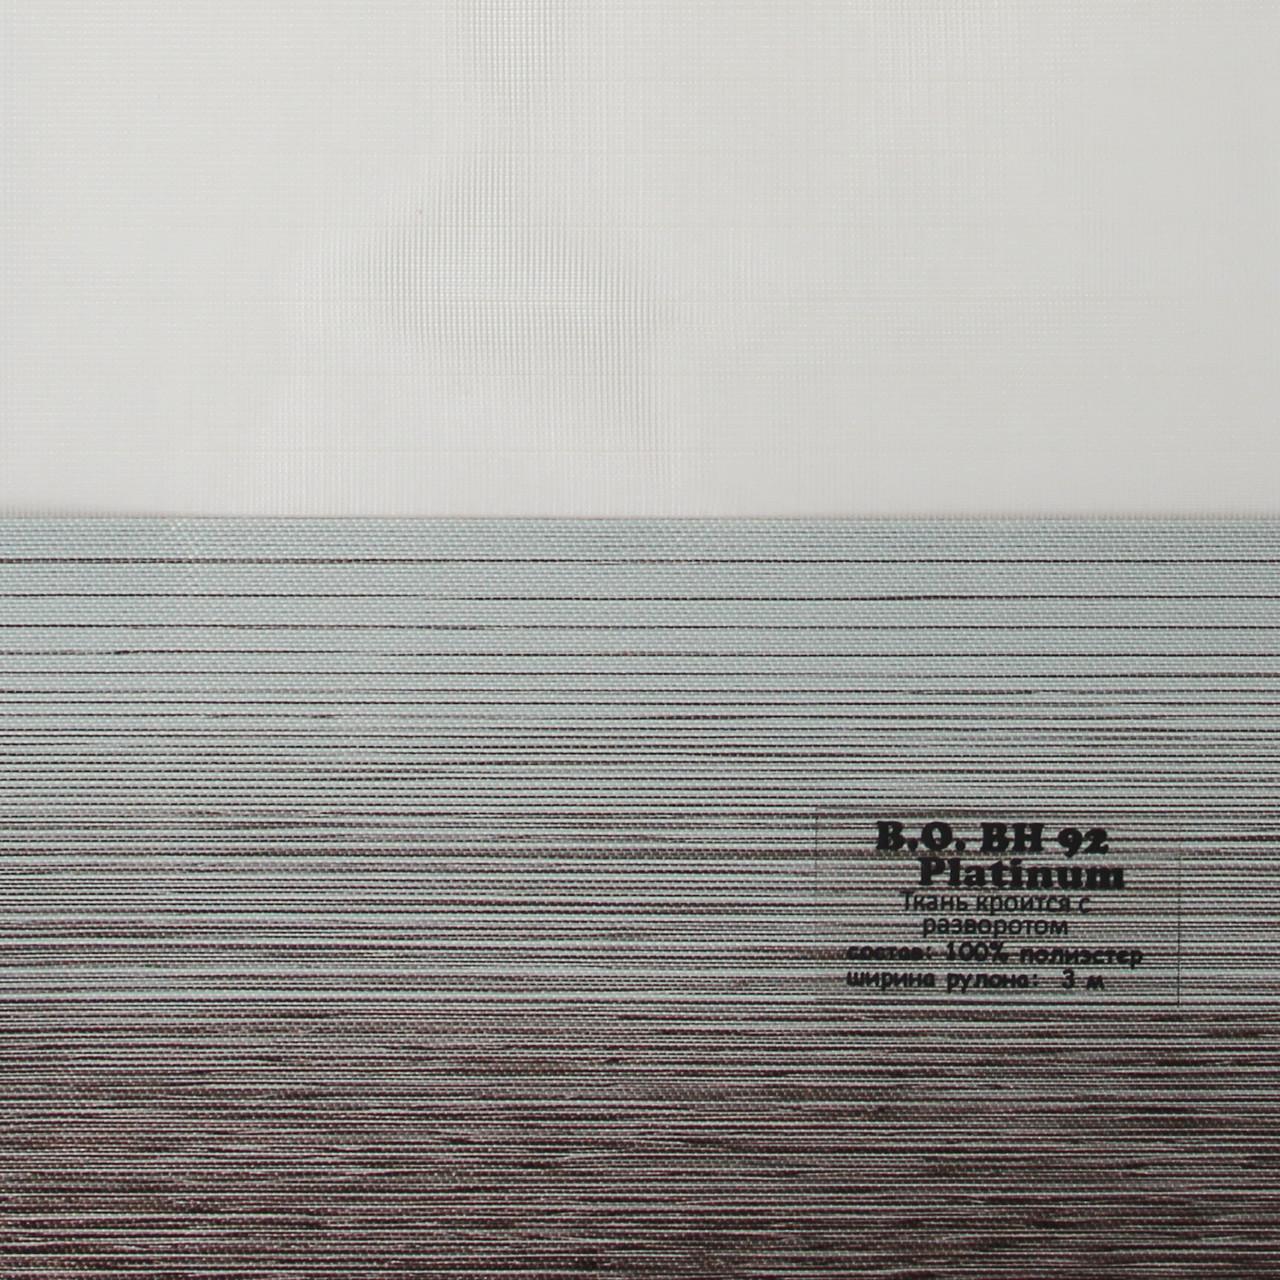 Рулонні штори День-Ніч Тканина Дует Лайт блек-аут ВН-92 Platinum